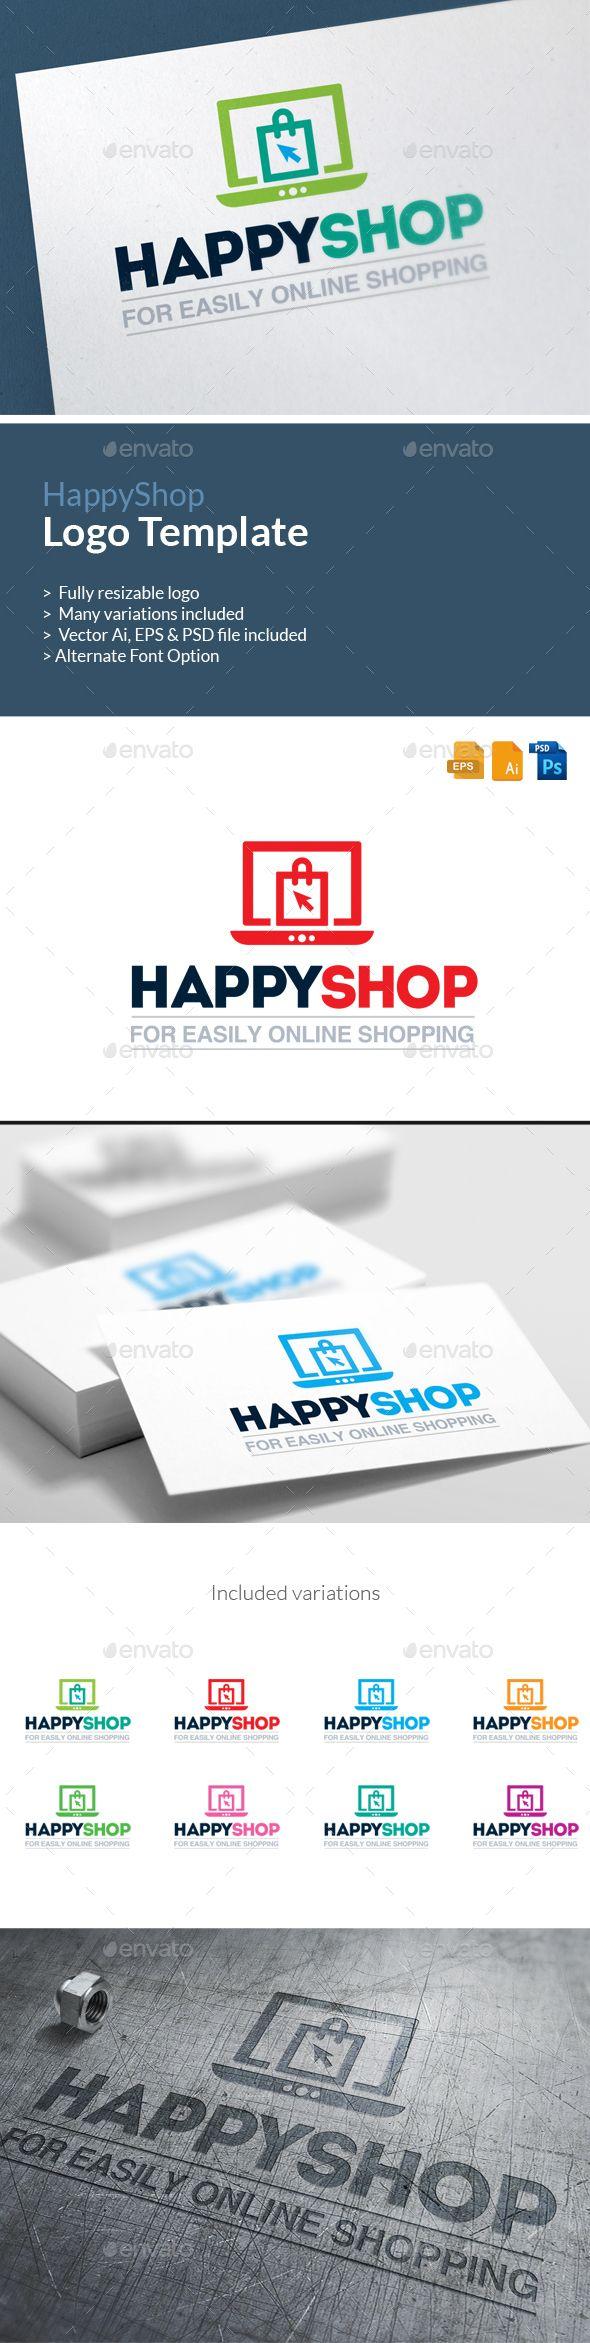 E-Commerce Logo Happy Shop Logo Template Vector EPS, AI. Download here: http://graphicriver.net/item/ecommerce-logo-happy-shop-logo-template/13933858?ref=ksioks